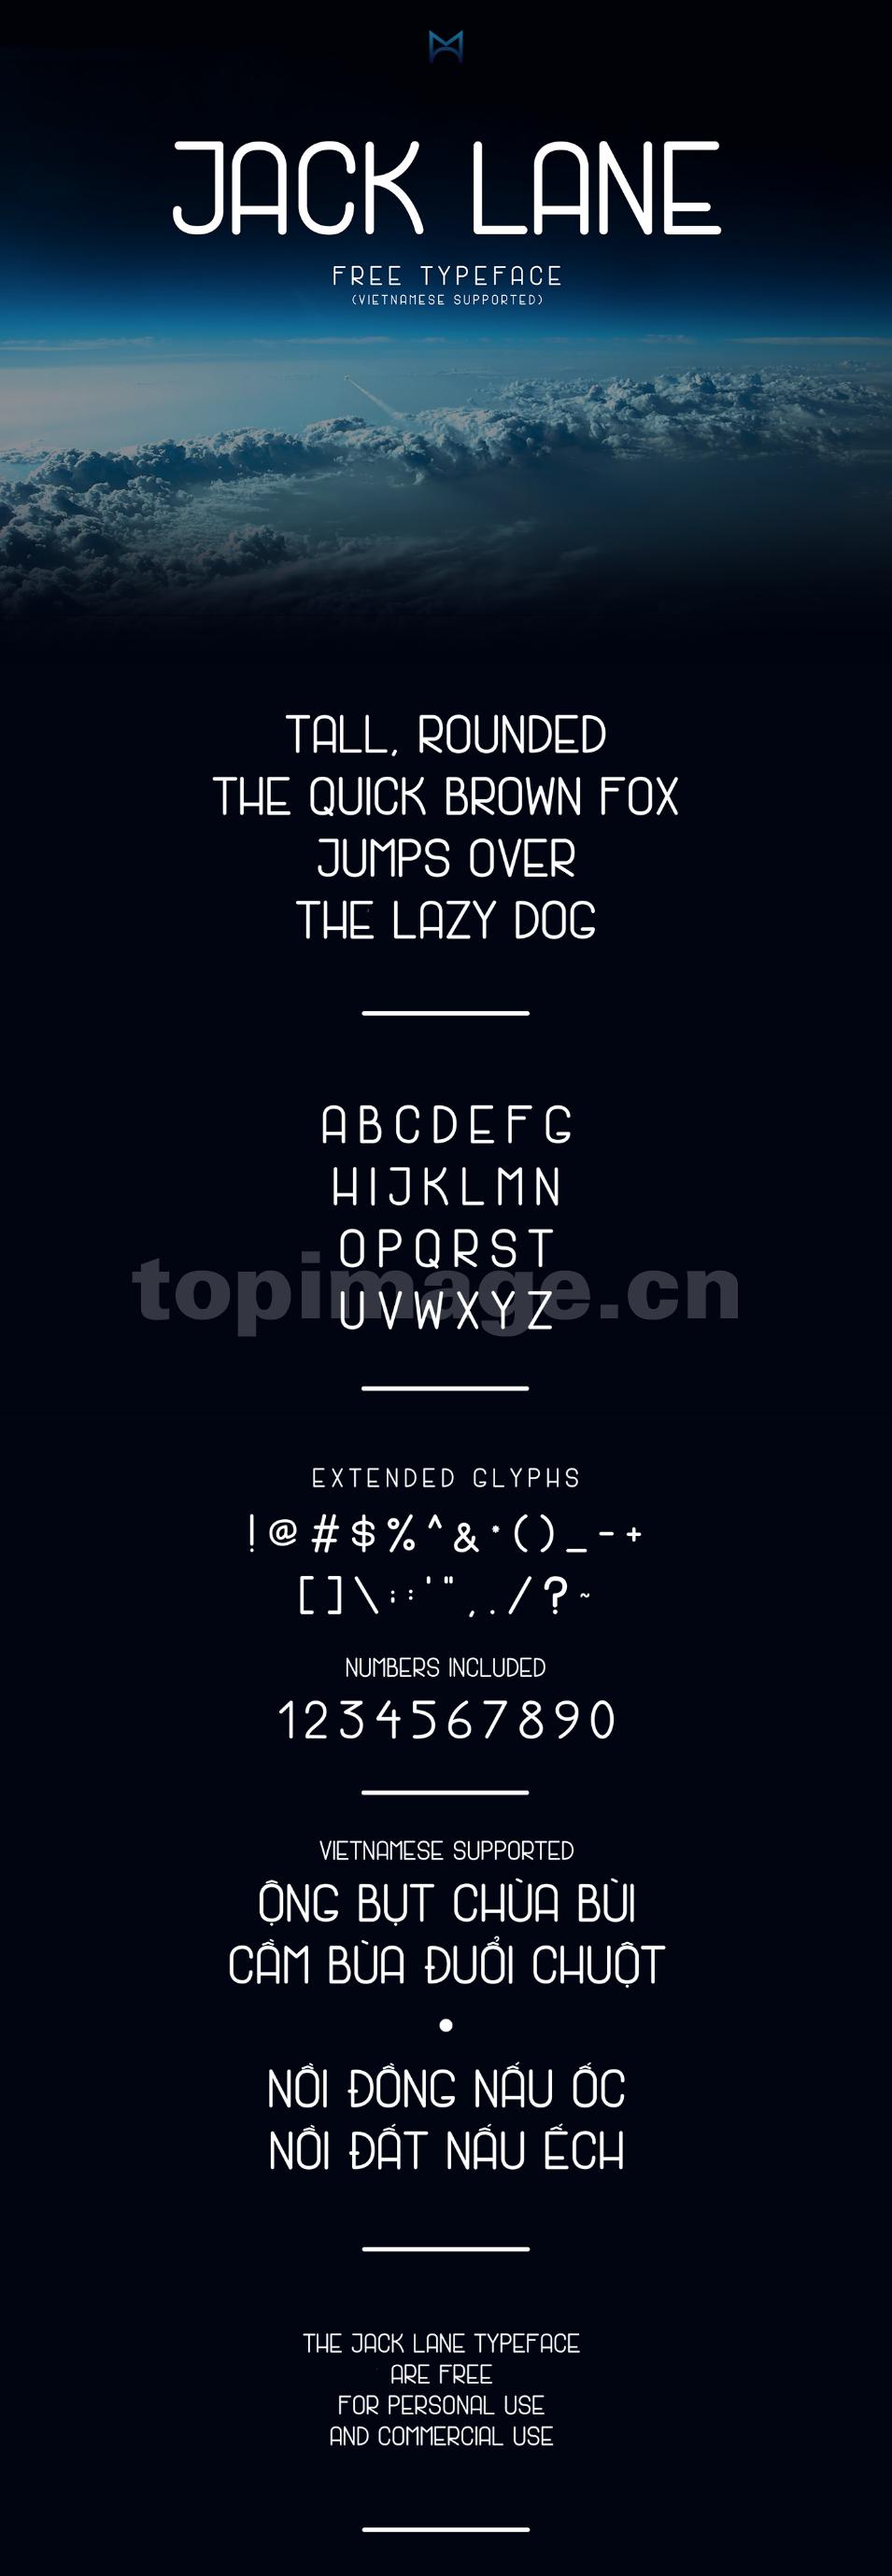 jack lane简约现代个性化时尚创意海报英文字体下载